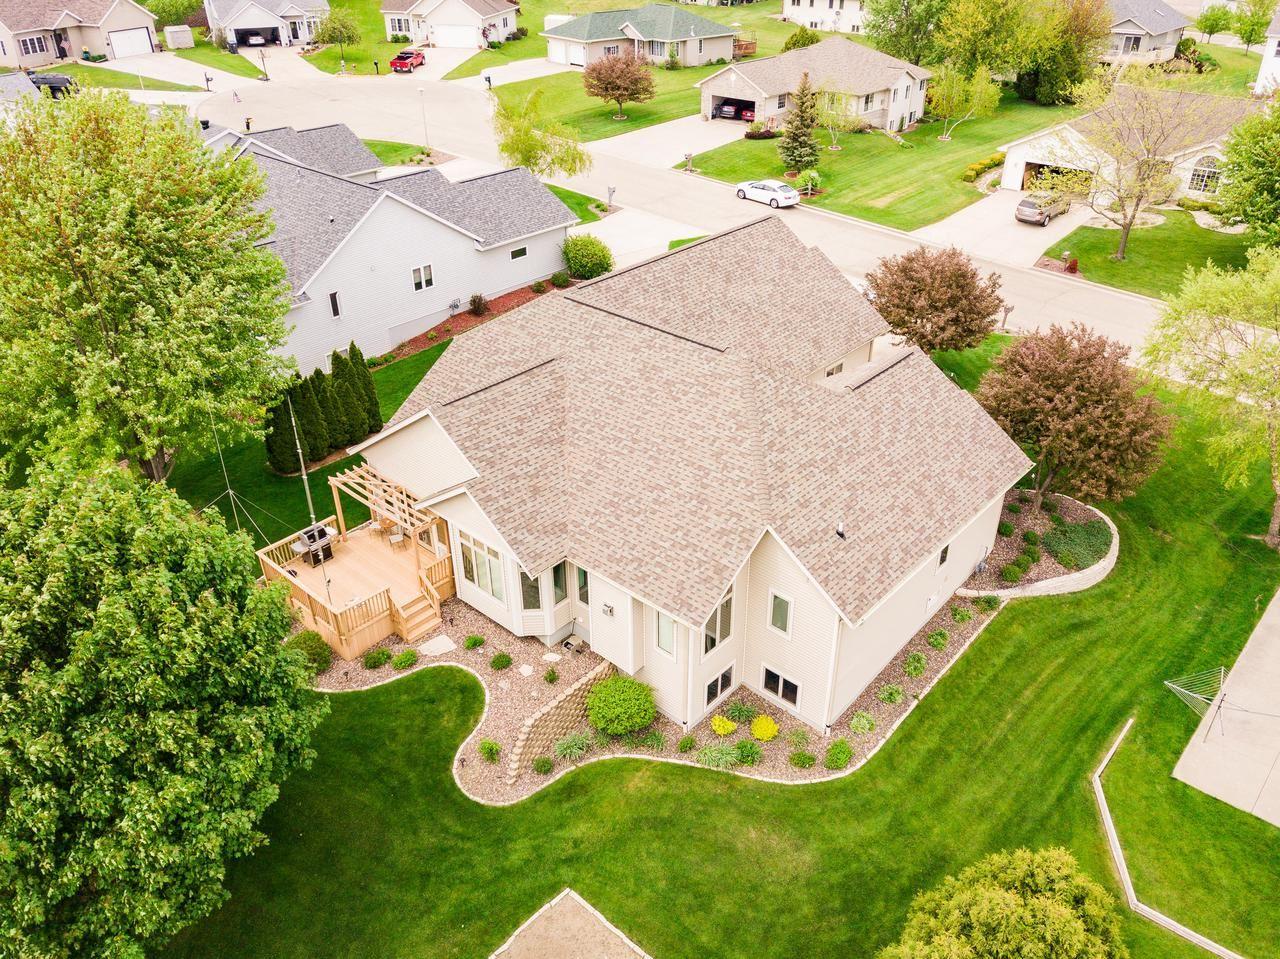 1627 Pine Ridge Ct, Mayville, WI 53050 - MLS#: 1741716